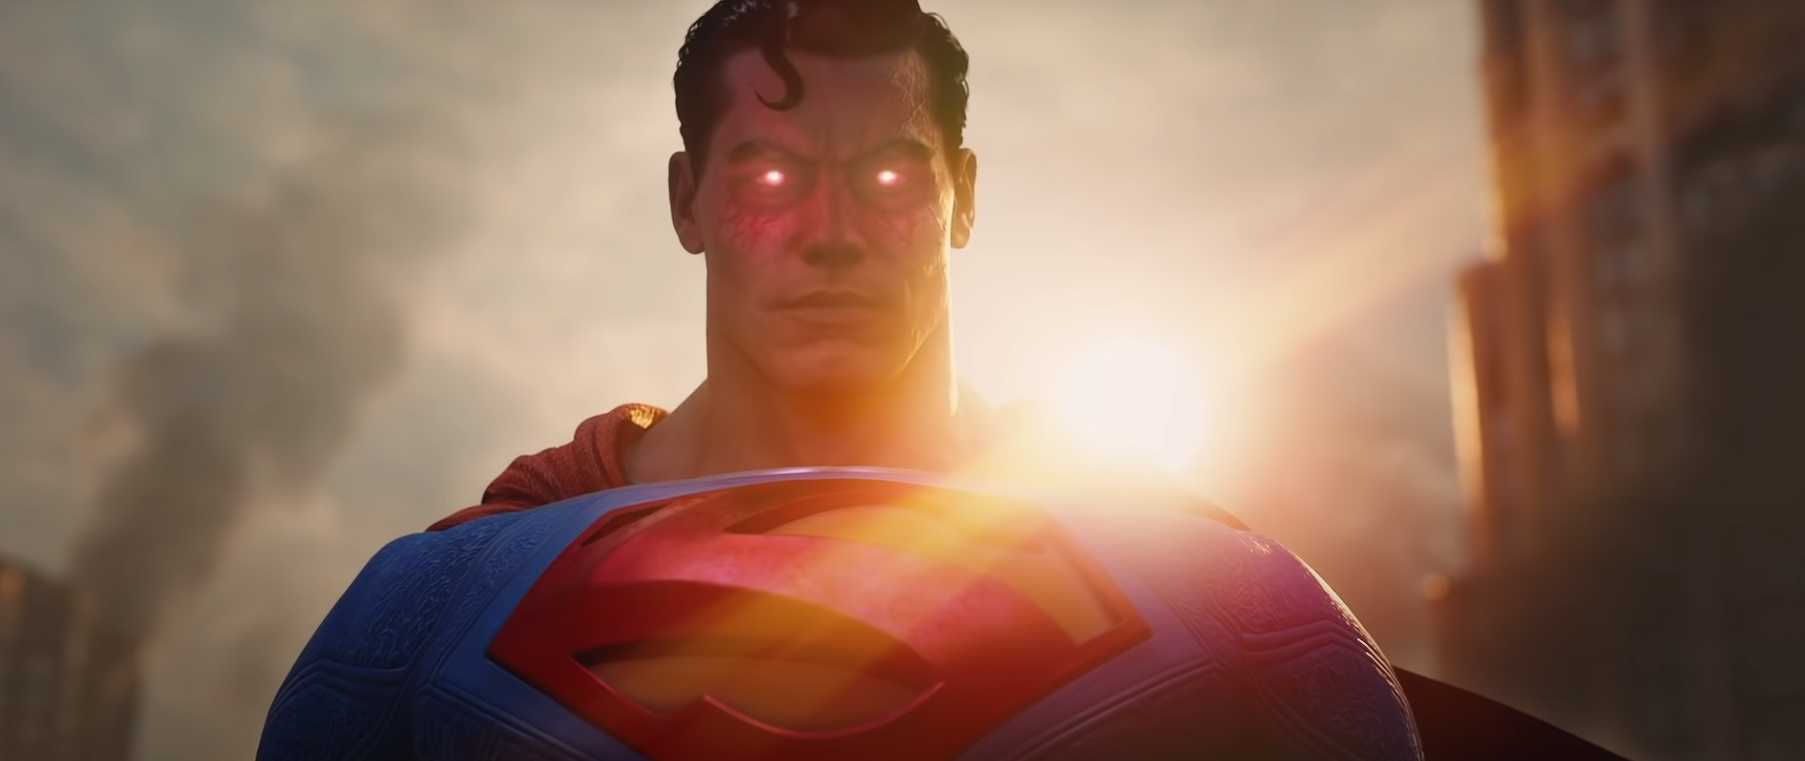 DC Reveals New Batman And Suicide Squad Games